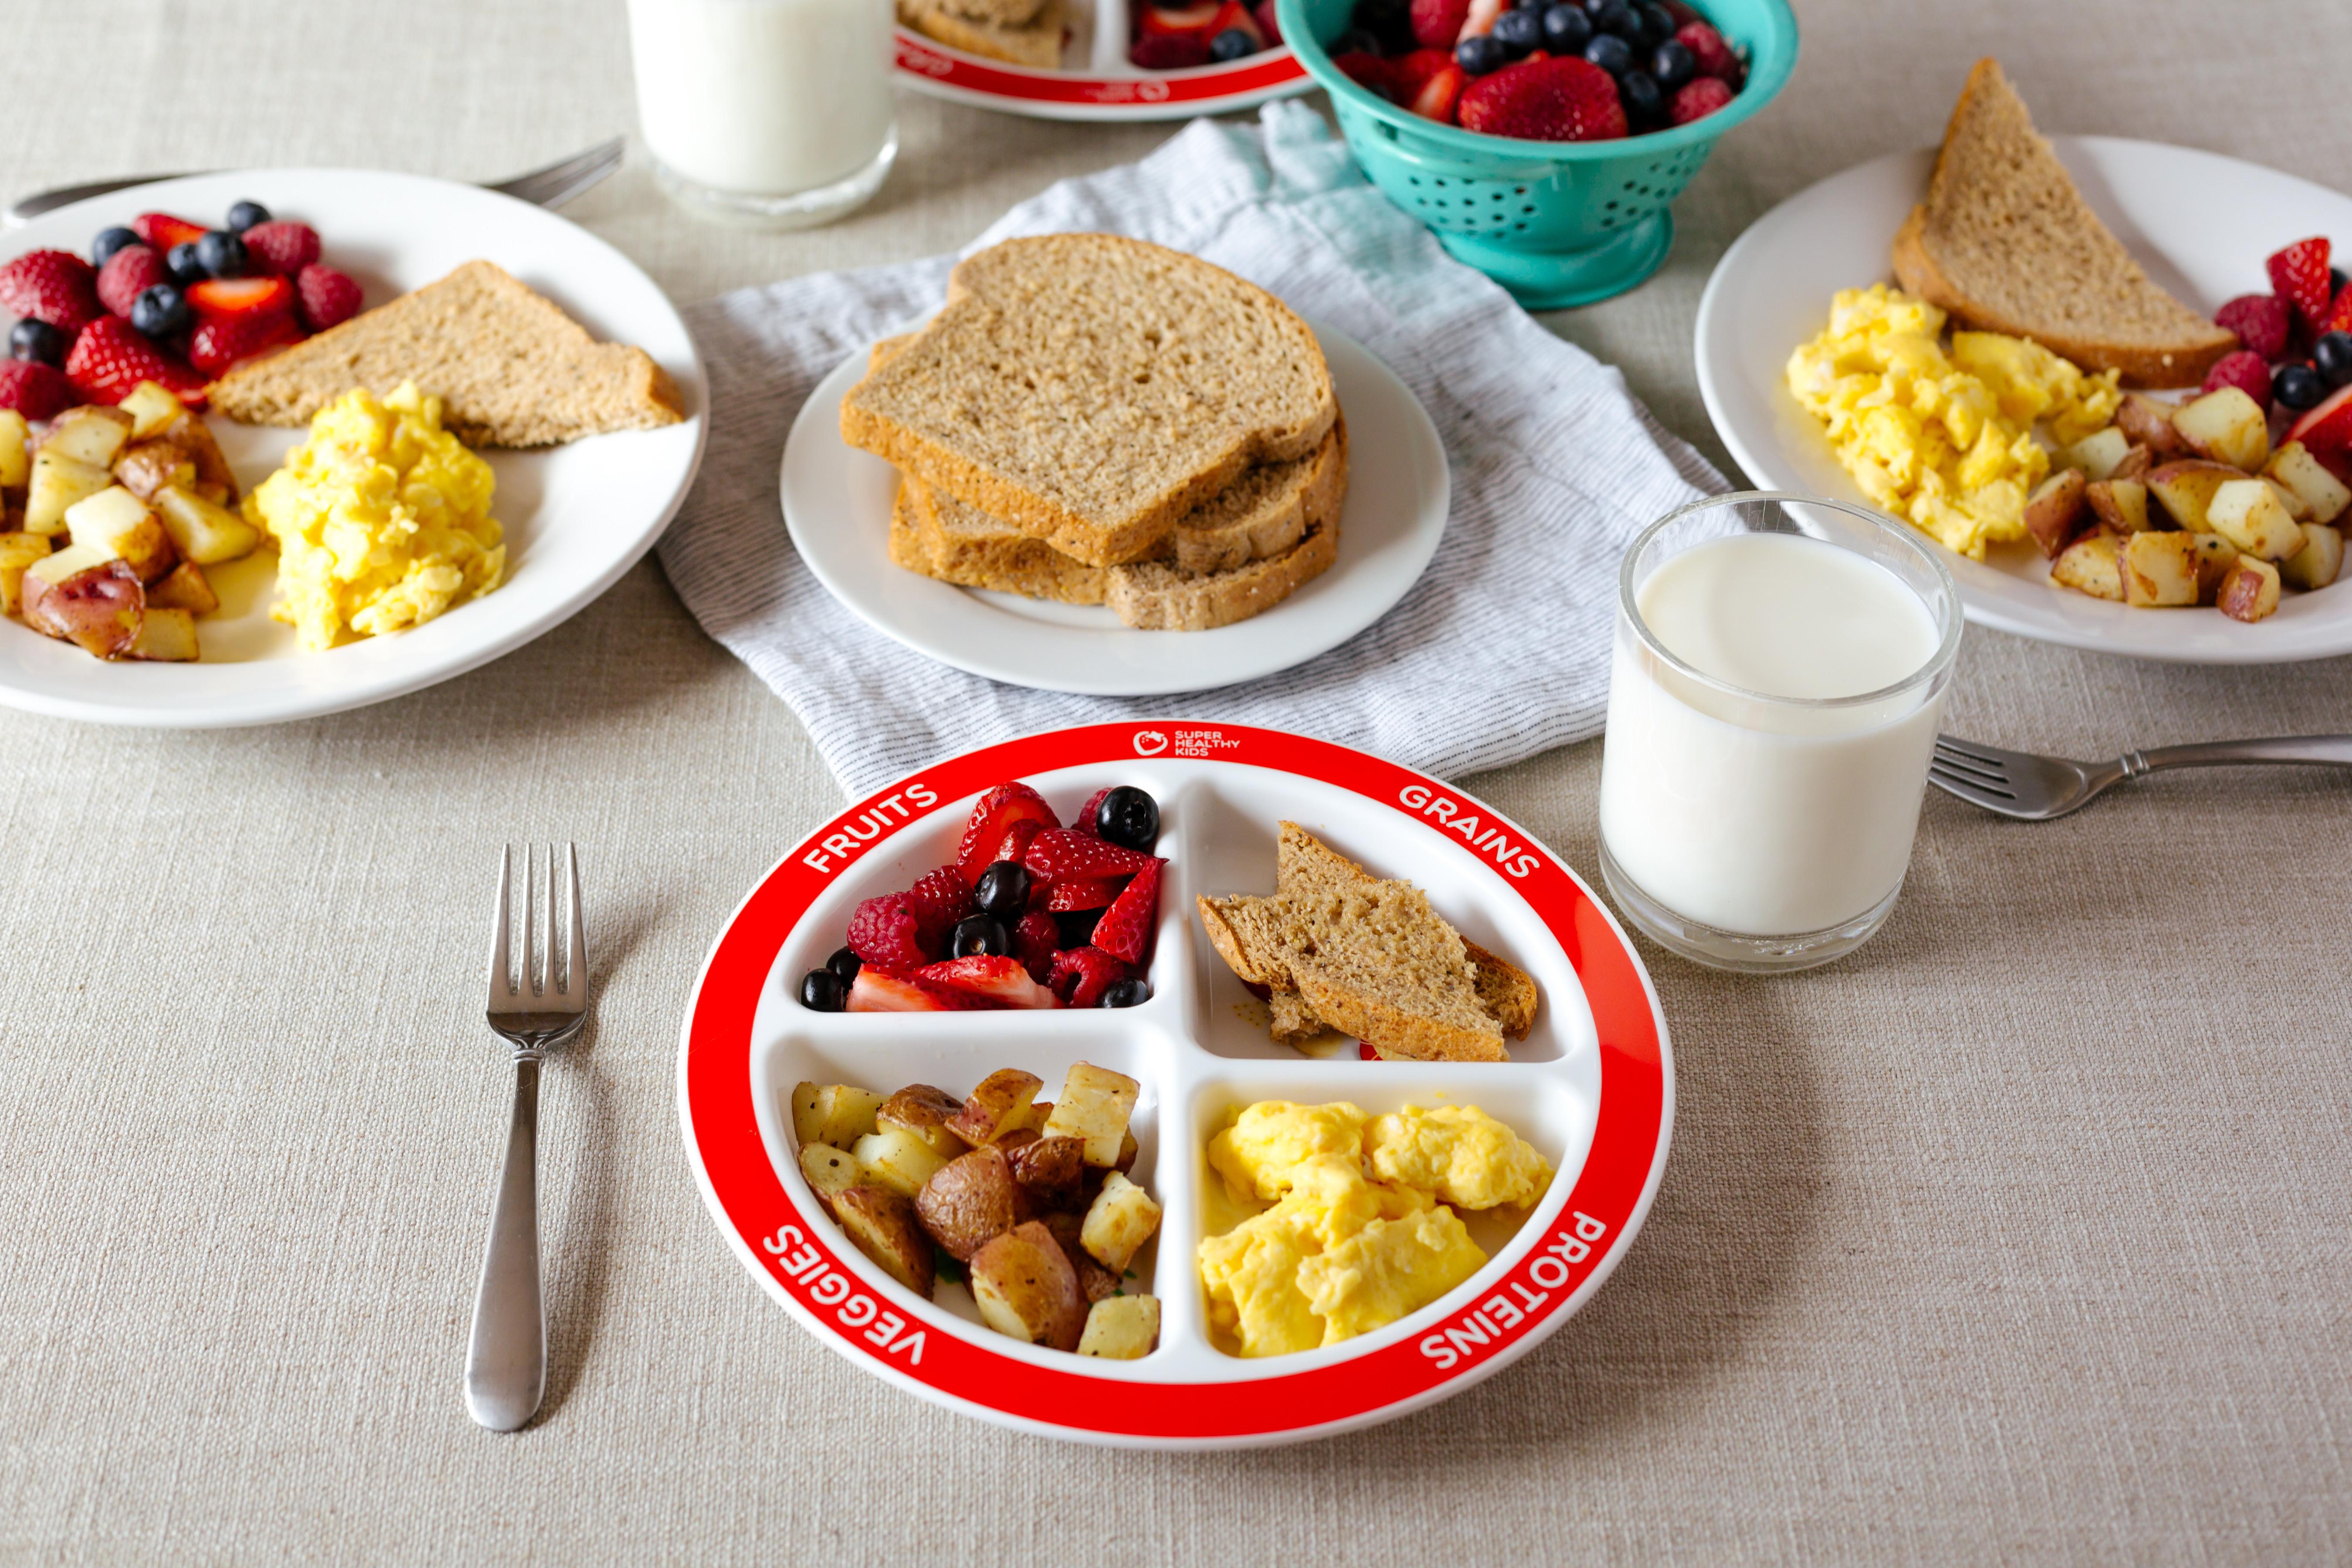 Healthy Nutritious Breakfast  Healthy Balanced Breakfast with MyPlate